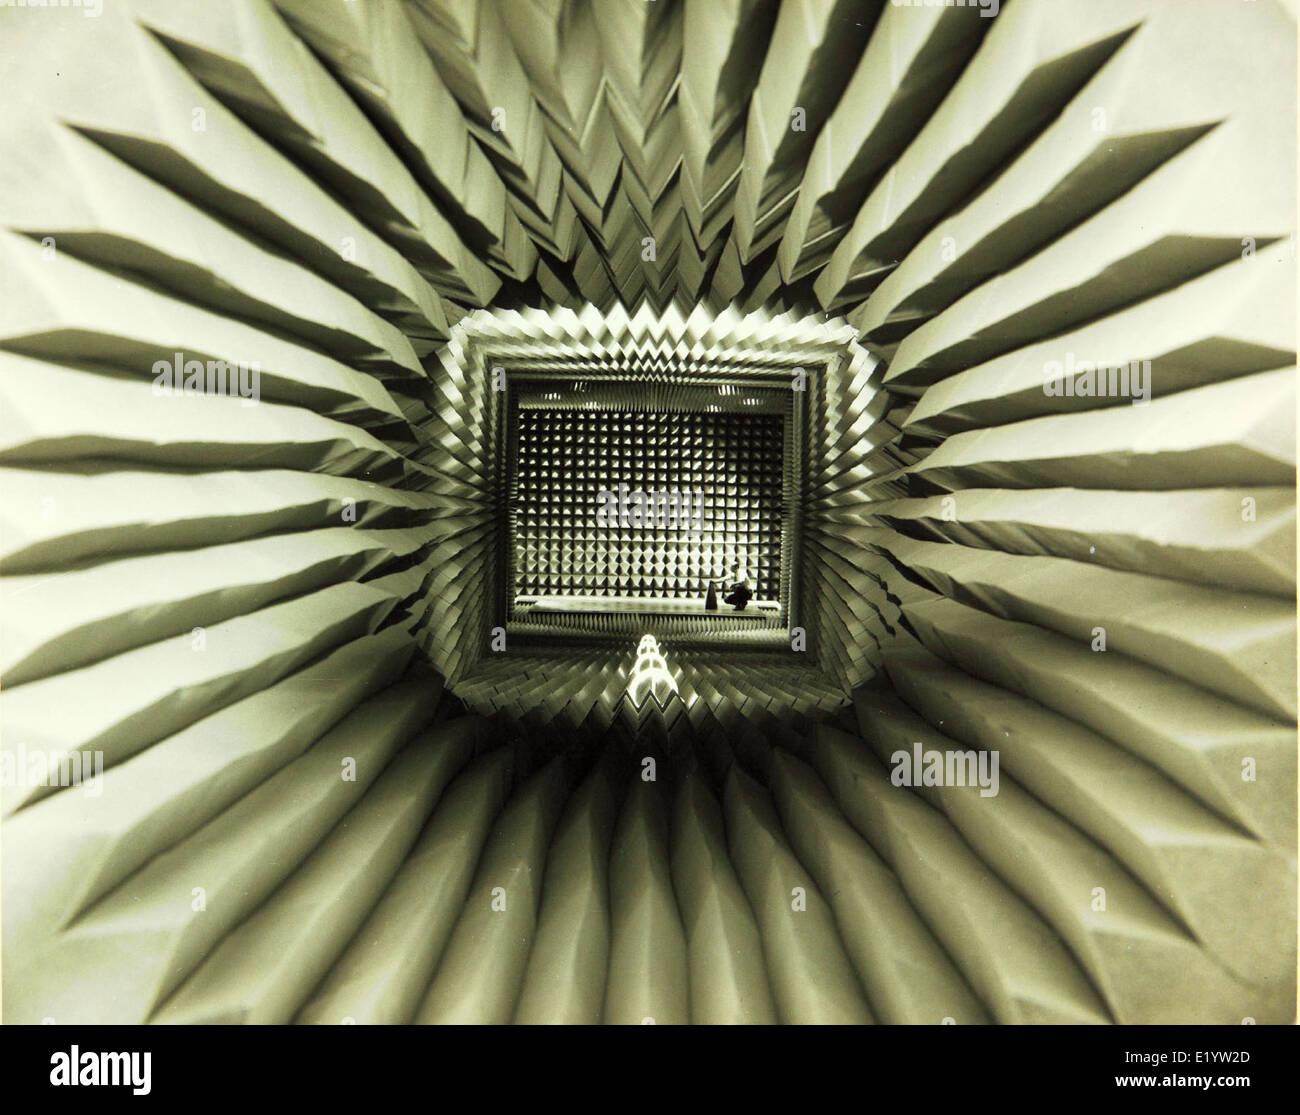 Convair/General Dynamics Wind Tunnel - Stock Image